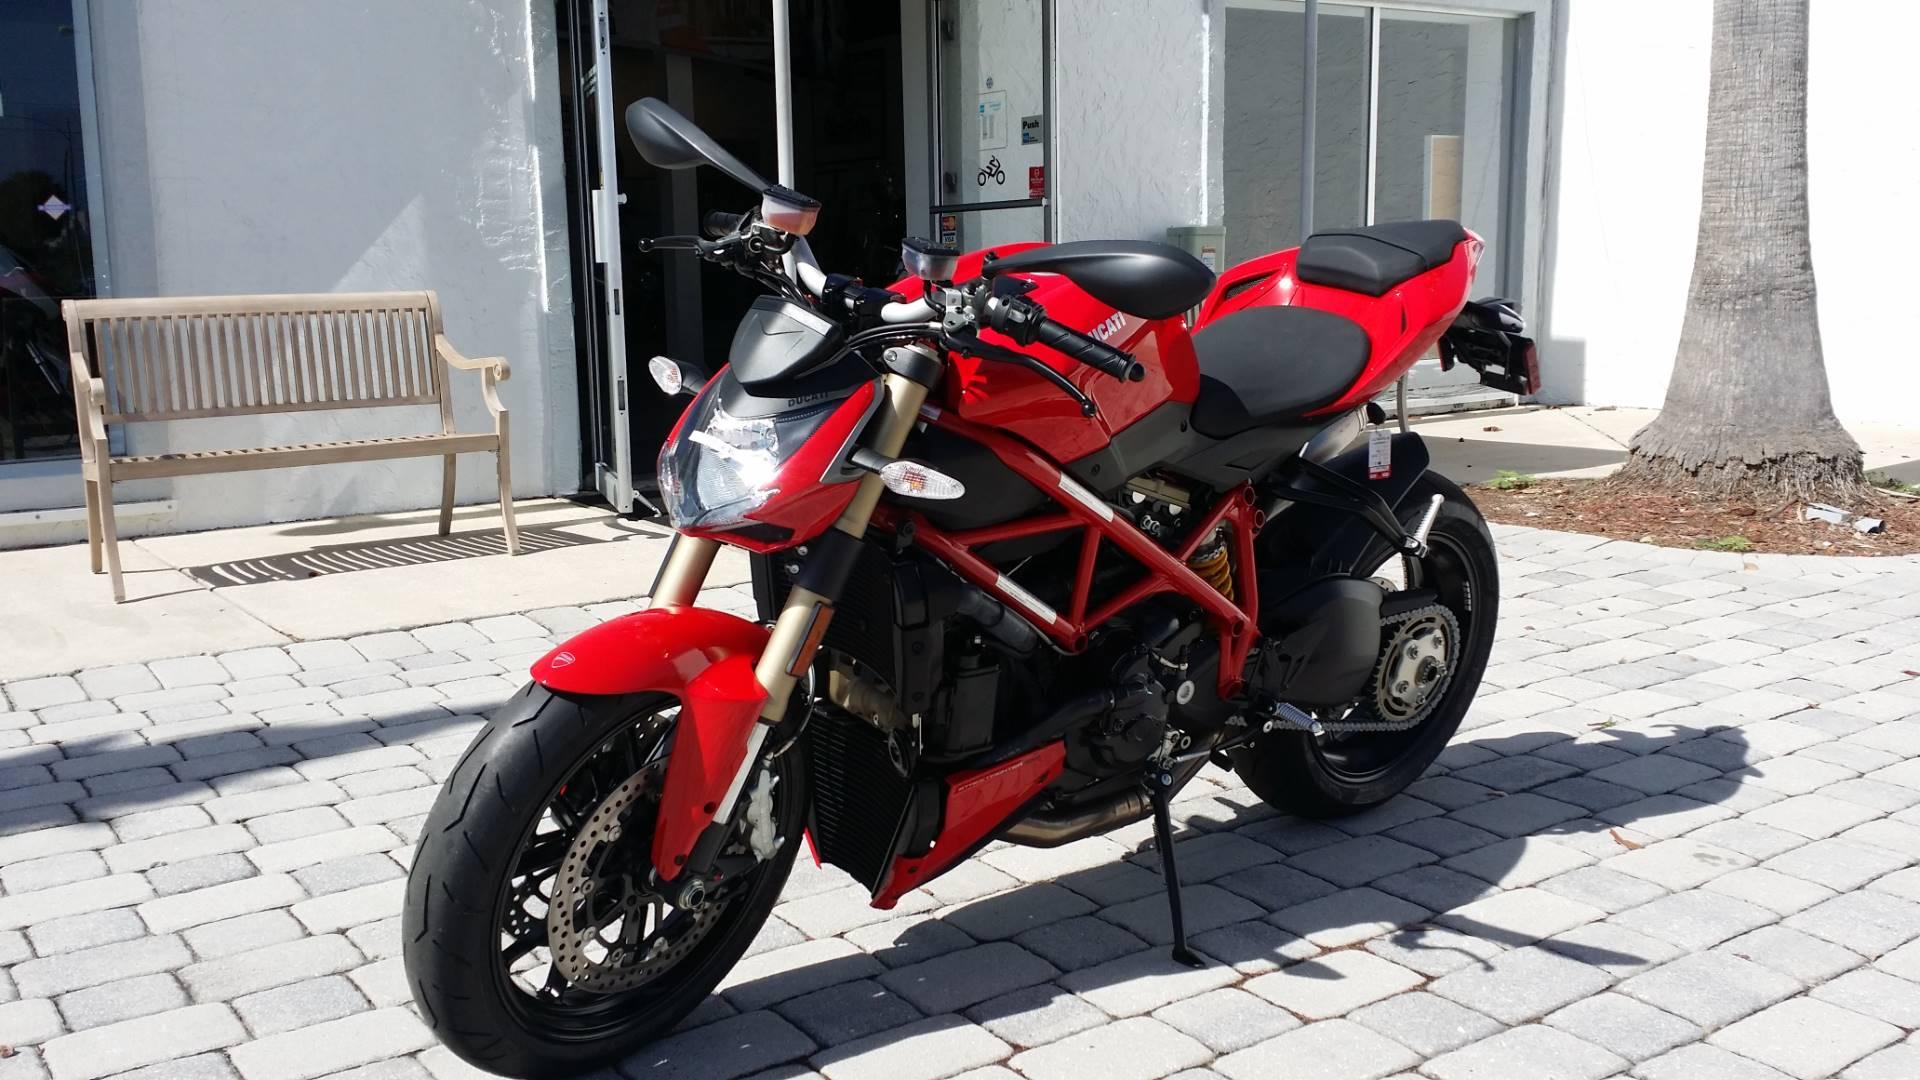 2015 Ducati Streetfighter 848 in Daytona Beach, Florida